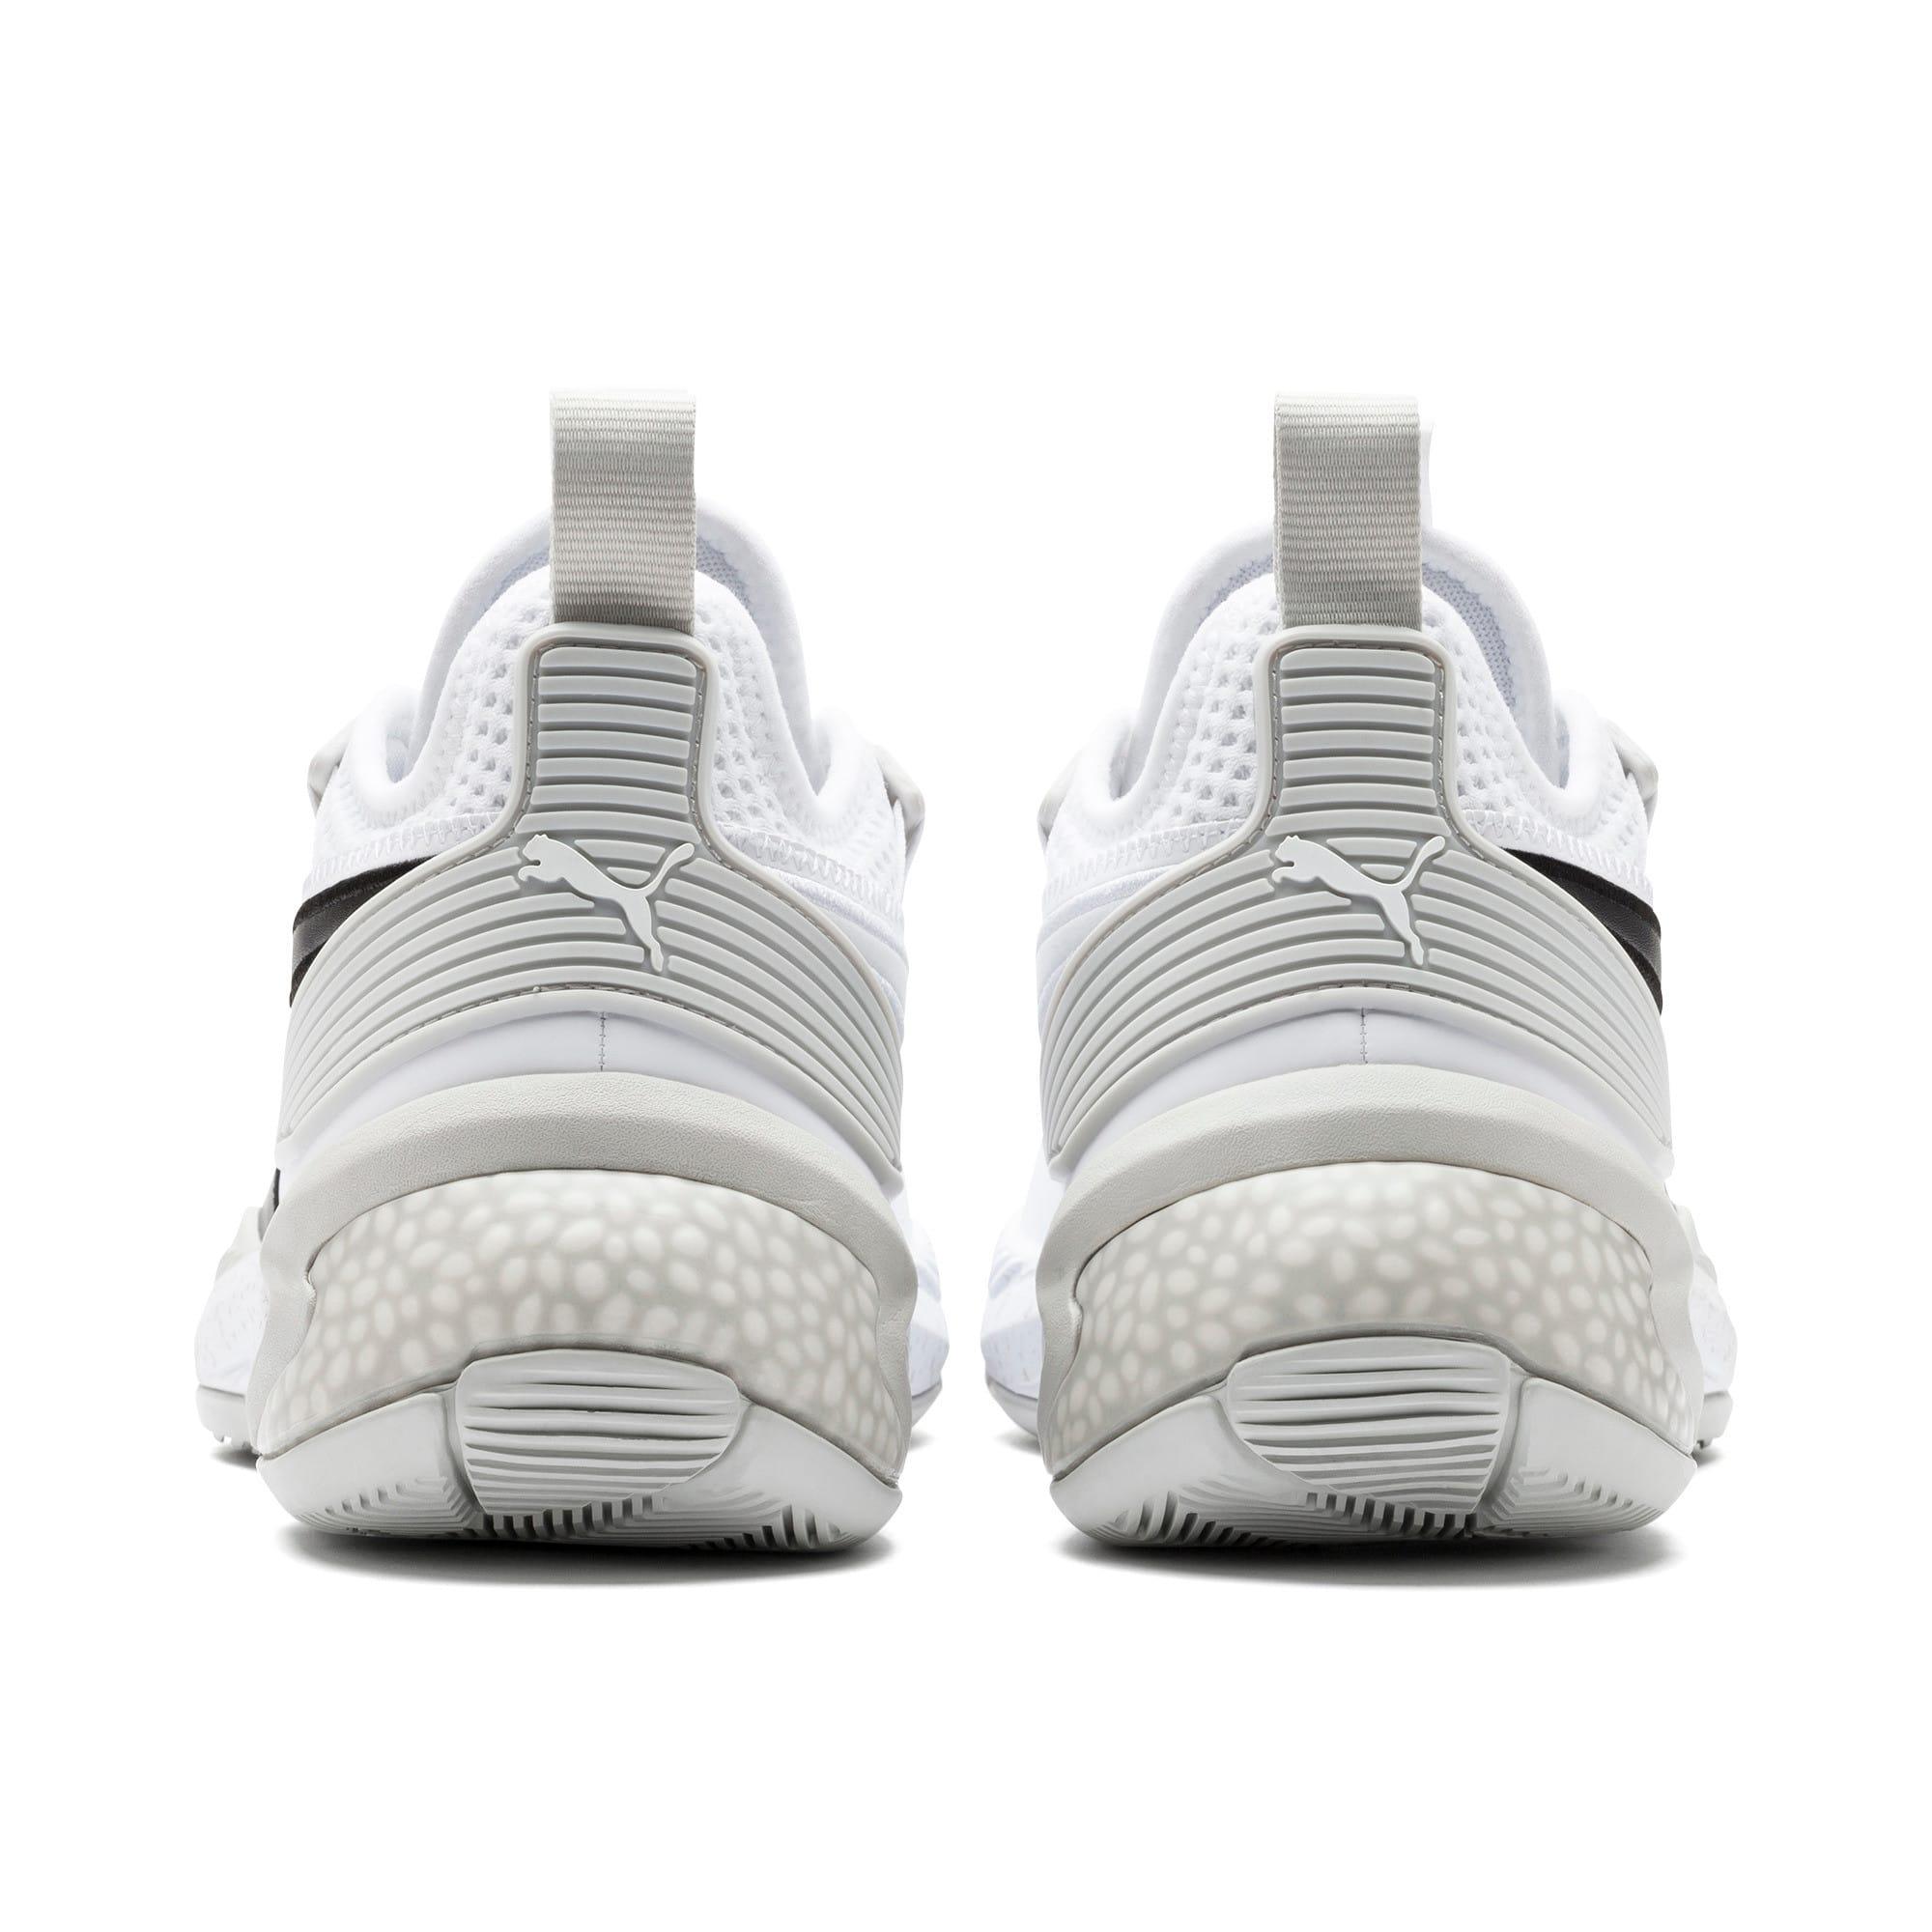 Thumbnail 3 of Uproar Core Men's Basketball Shoes, Puma White-Glacier Gray, medium